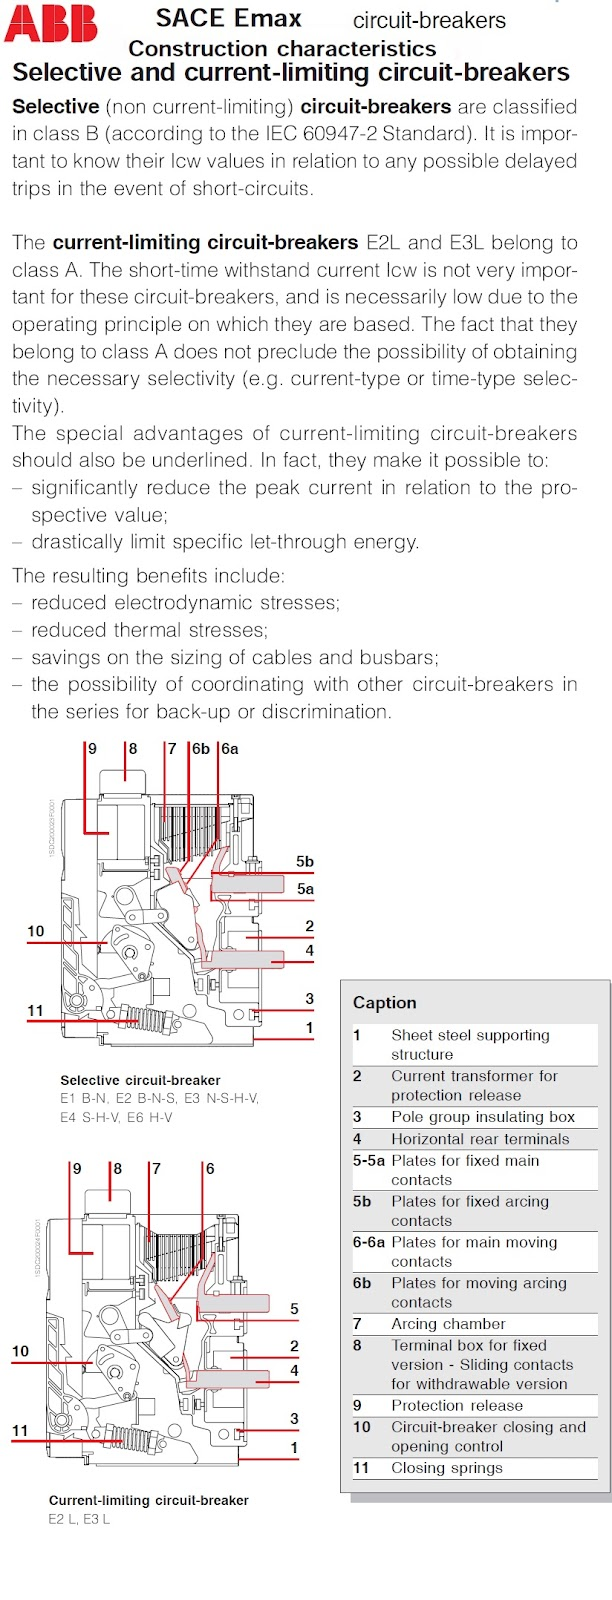 Abb sace E3 Breaker manual